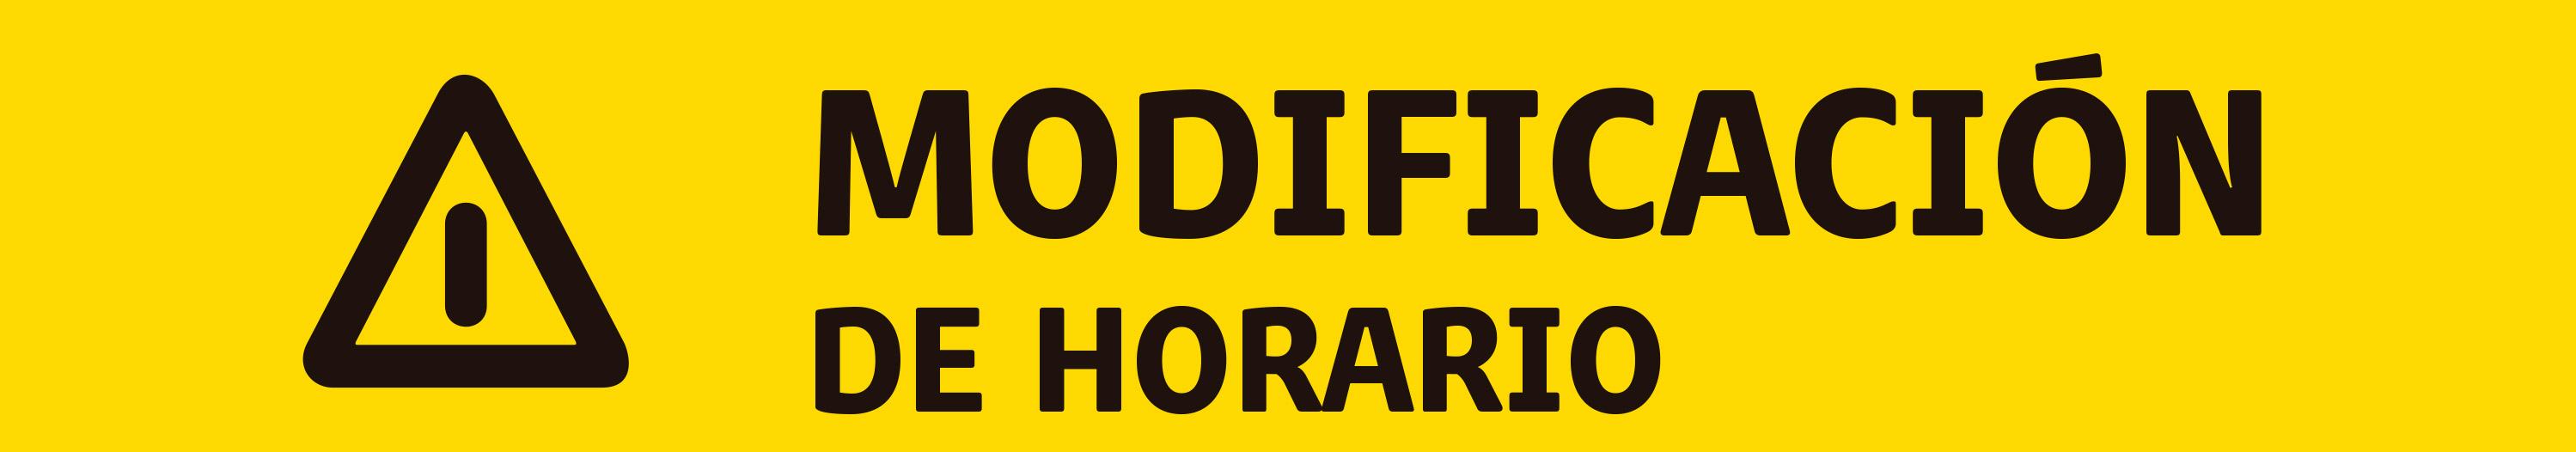 MODIFICACIÓN DE HORARIO F06 / F20